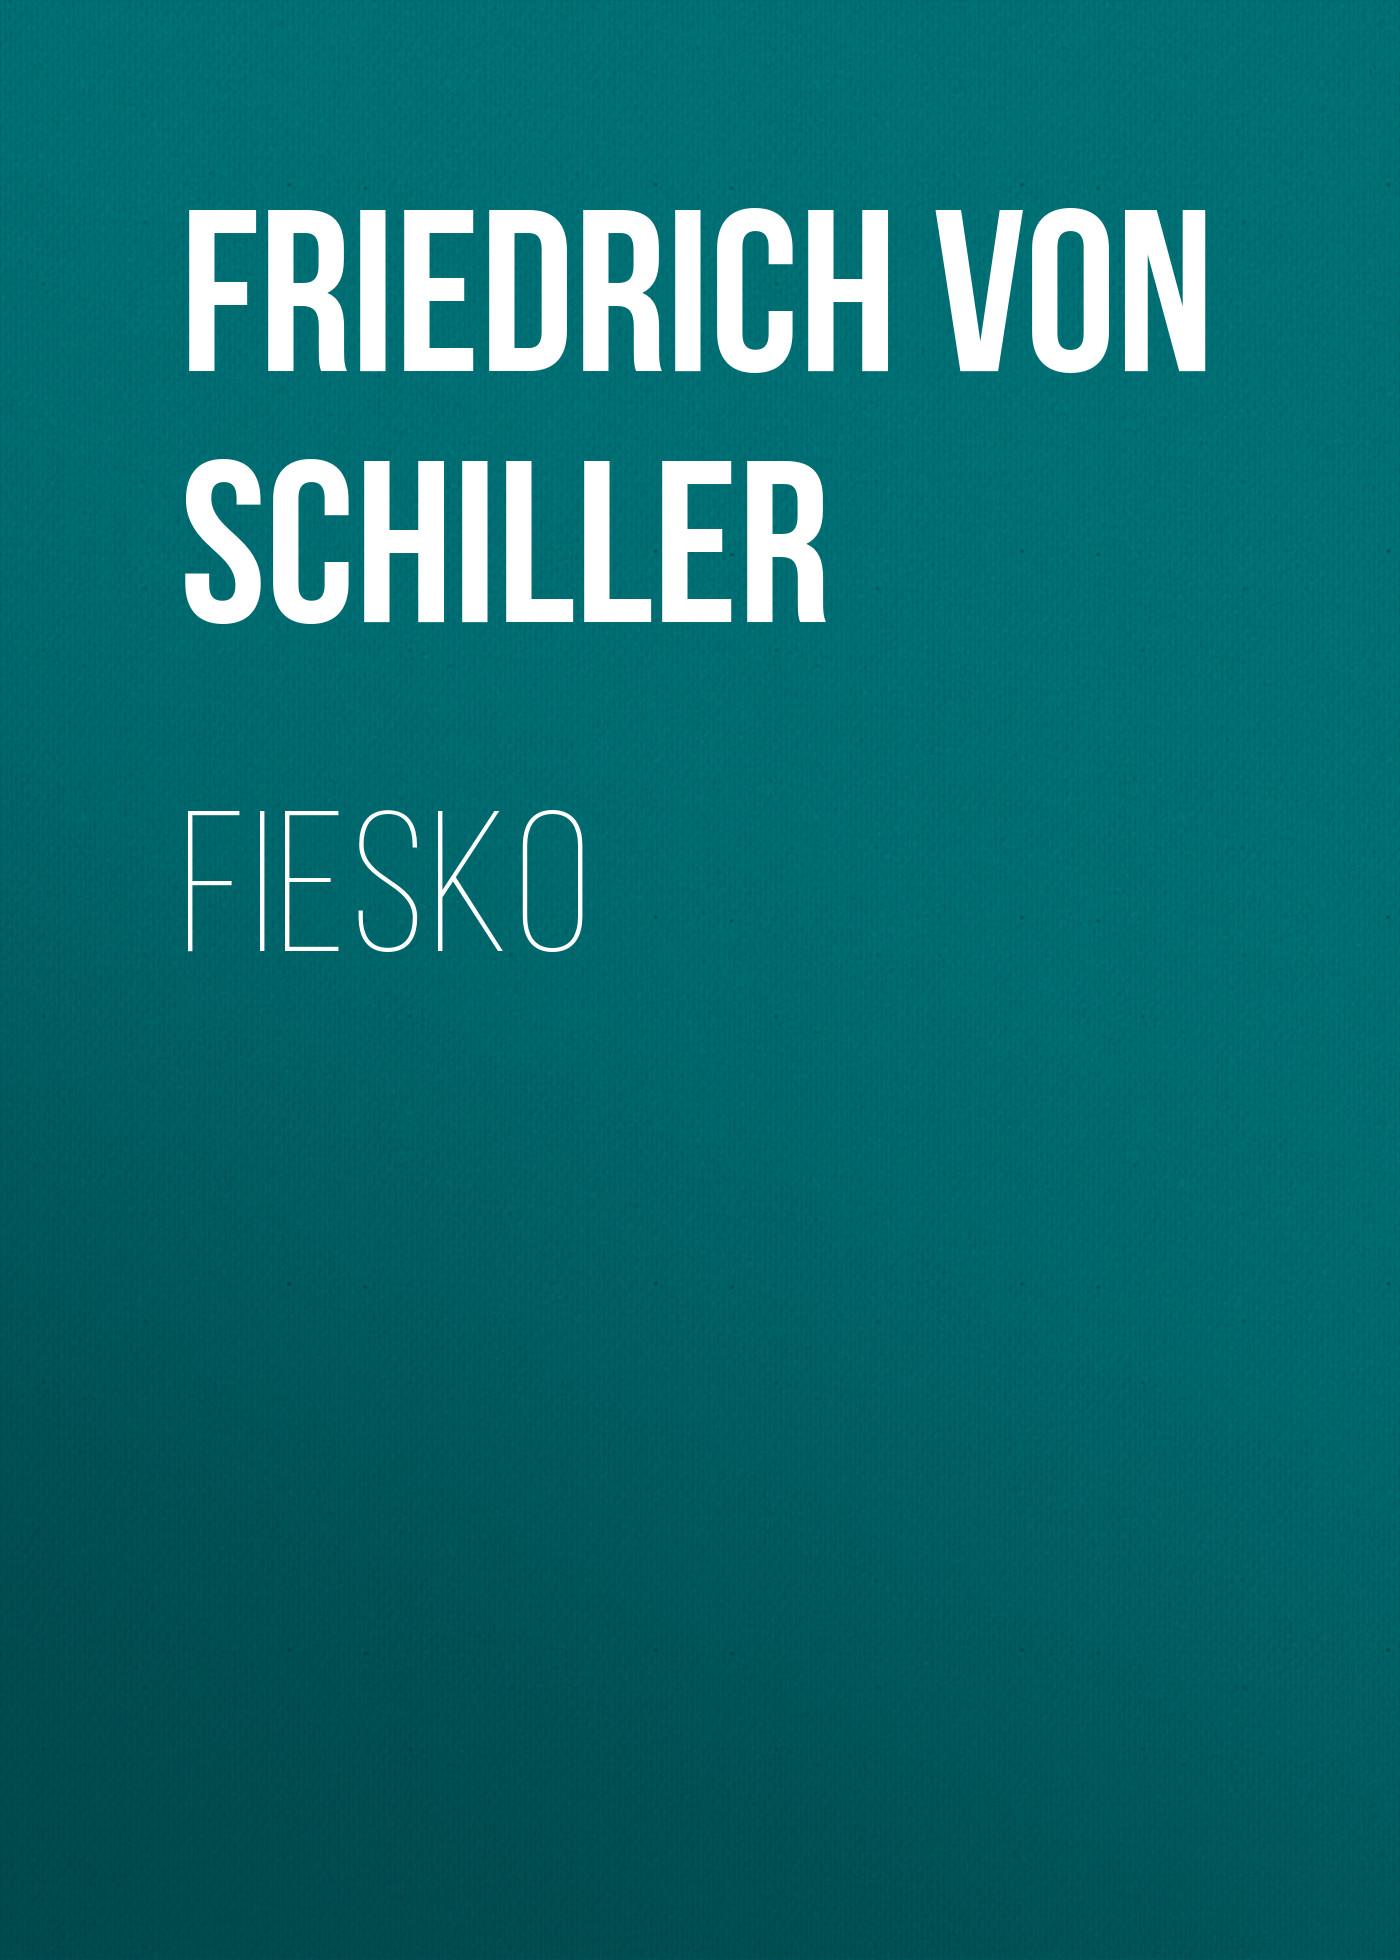 Friedrich von Schiller Fiesko t5971 700ml refill ink cartridge with chip resetter for epson stylus pro 7700 9700 7710 printer for epson t5971 t5974 t5978